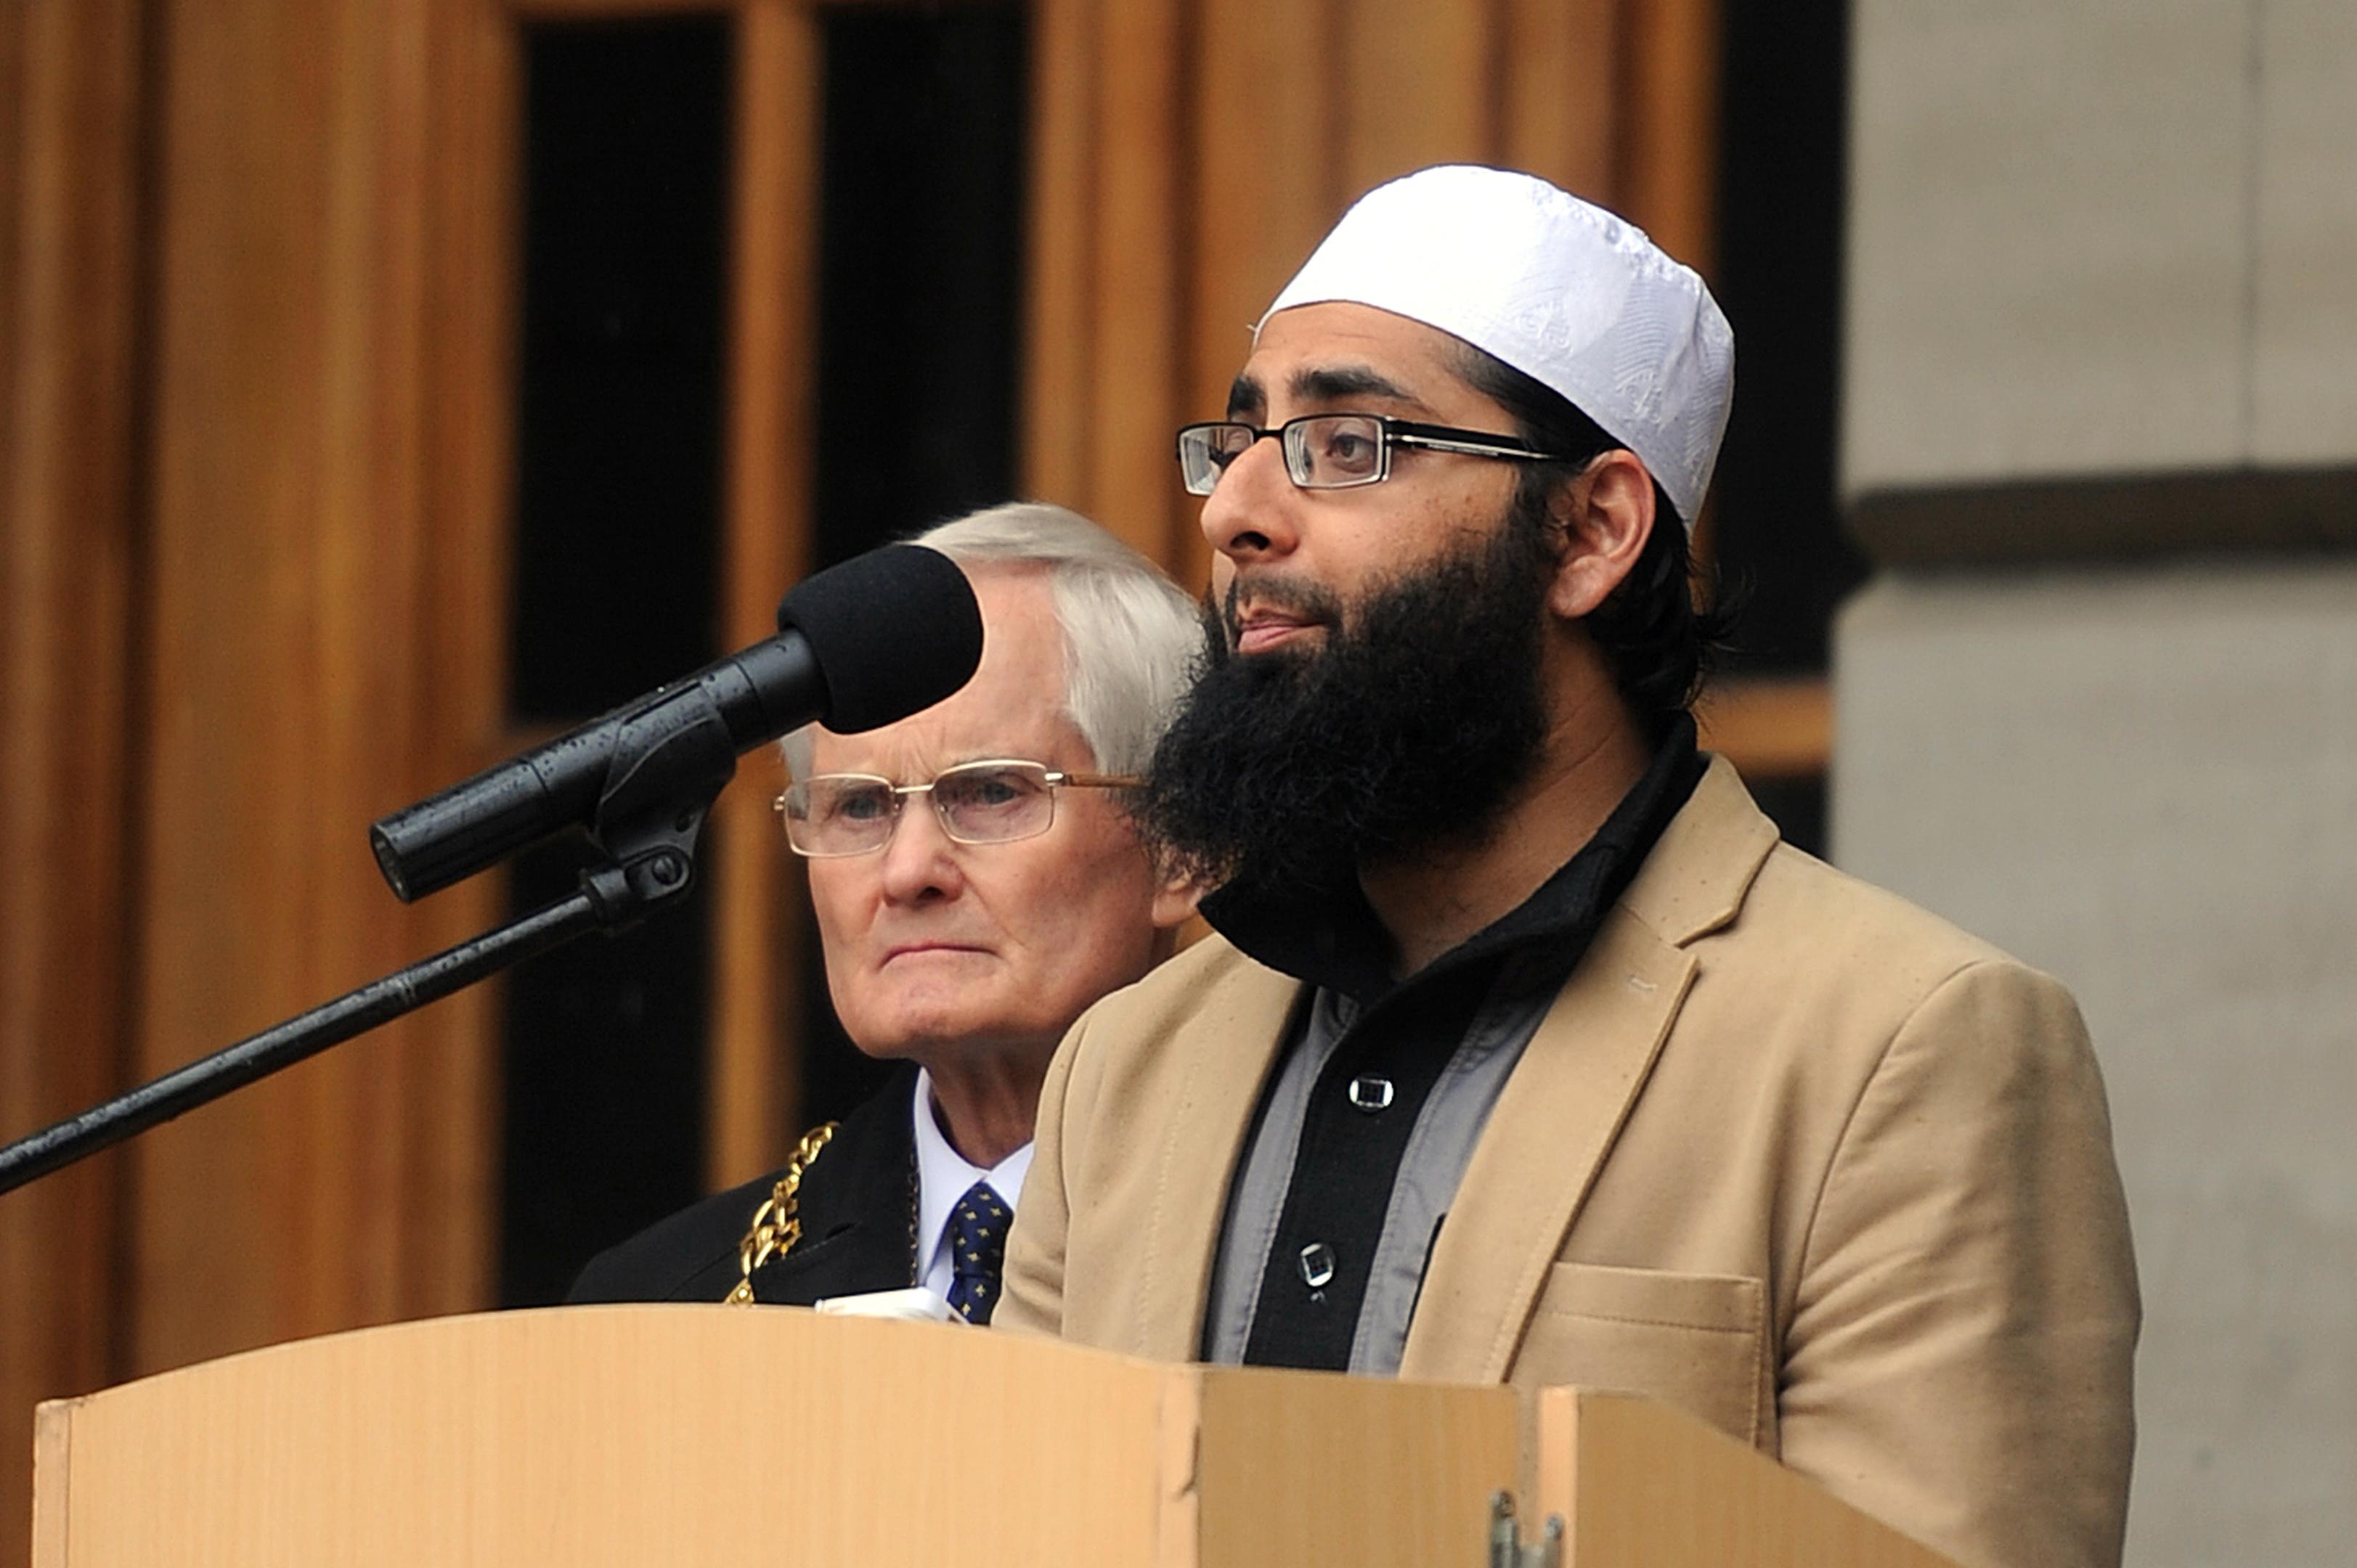 Imam Hamza addresses the crowd in City Square.